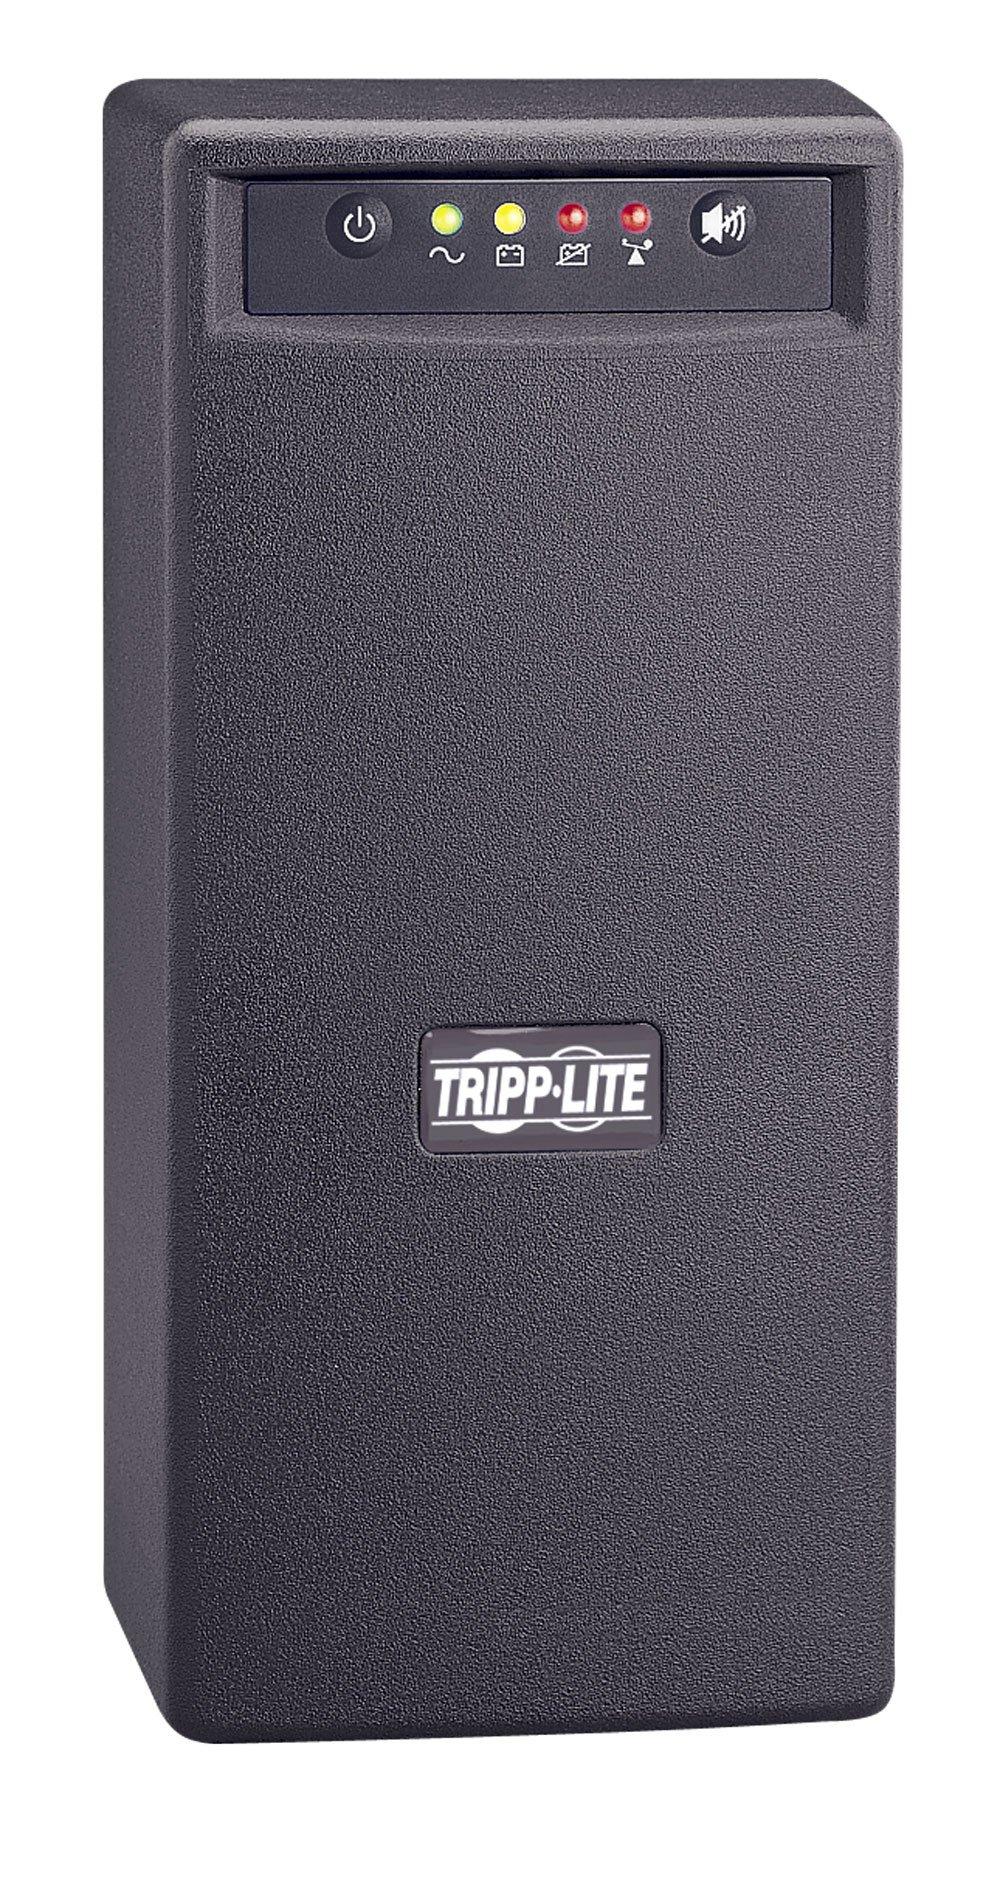 Tripp Lite 800VA UPS Backup, 475W Line-Interactive AVR, Tower, USB (OMNIVS800)